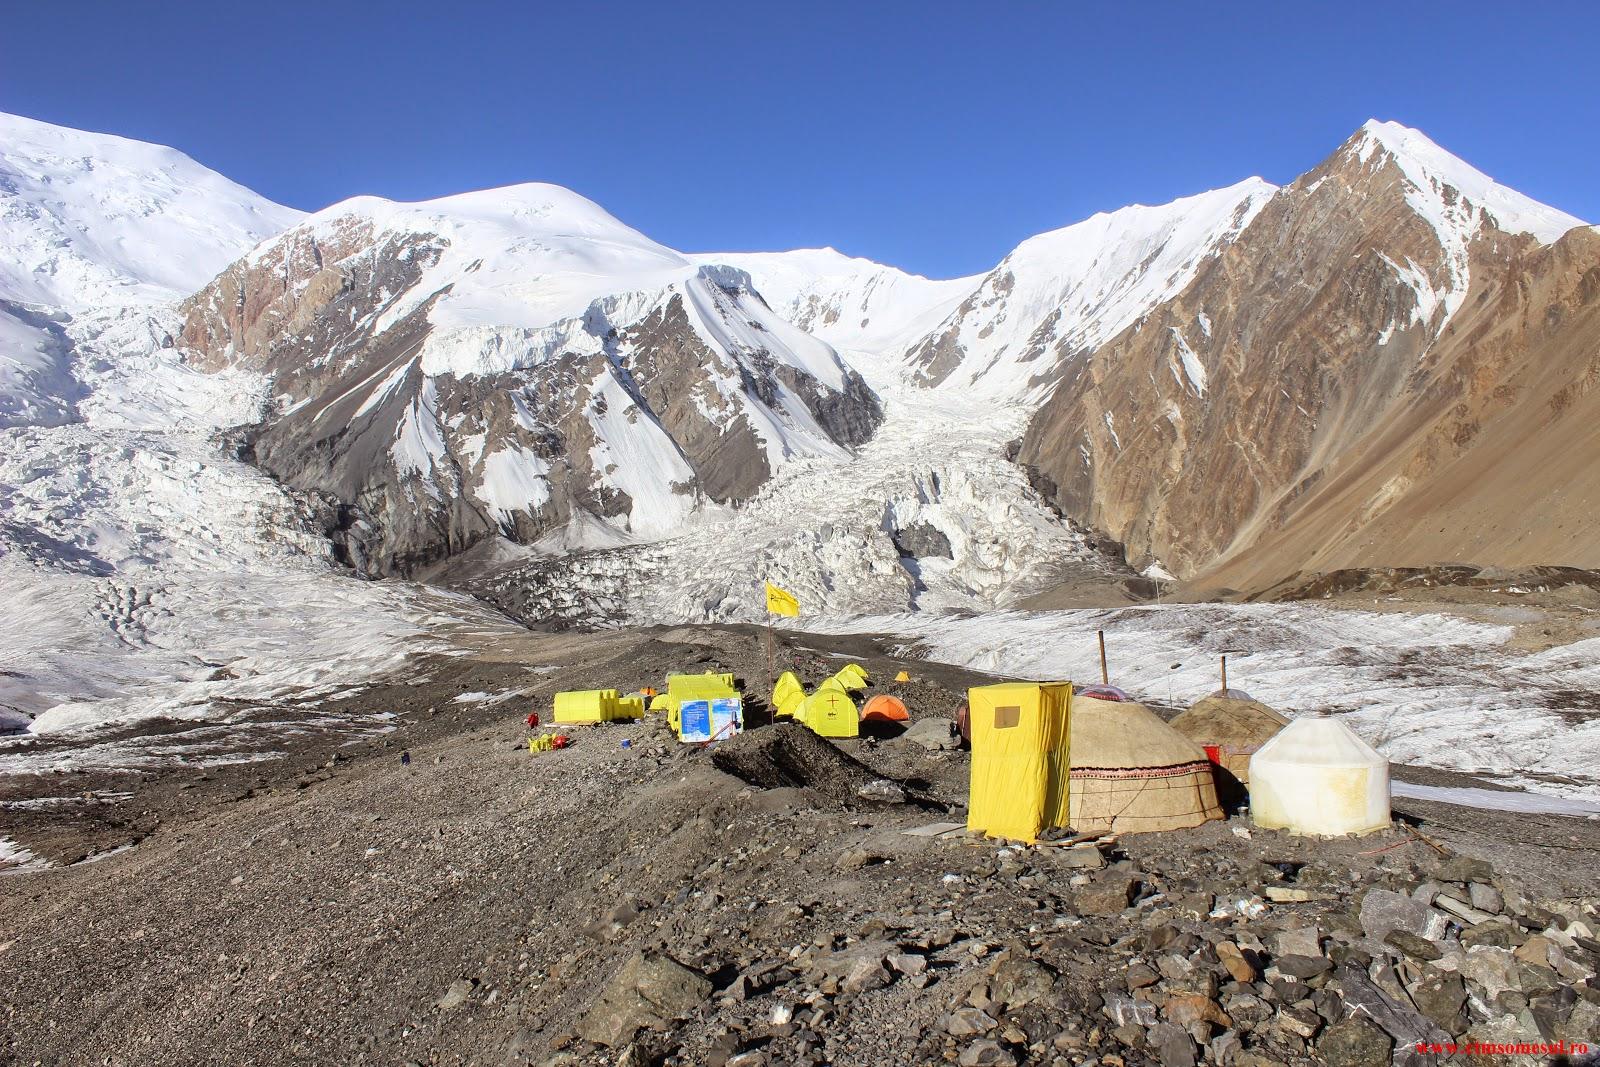 Camp 1 4400 m